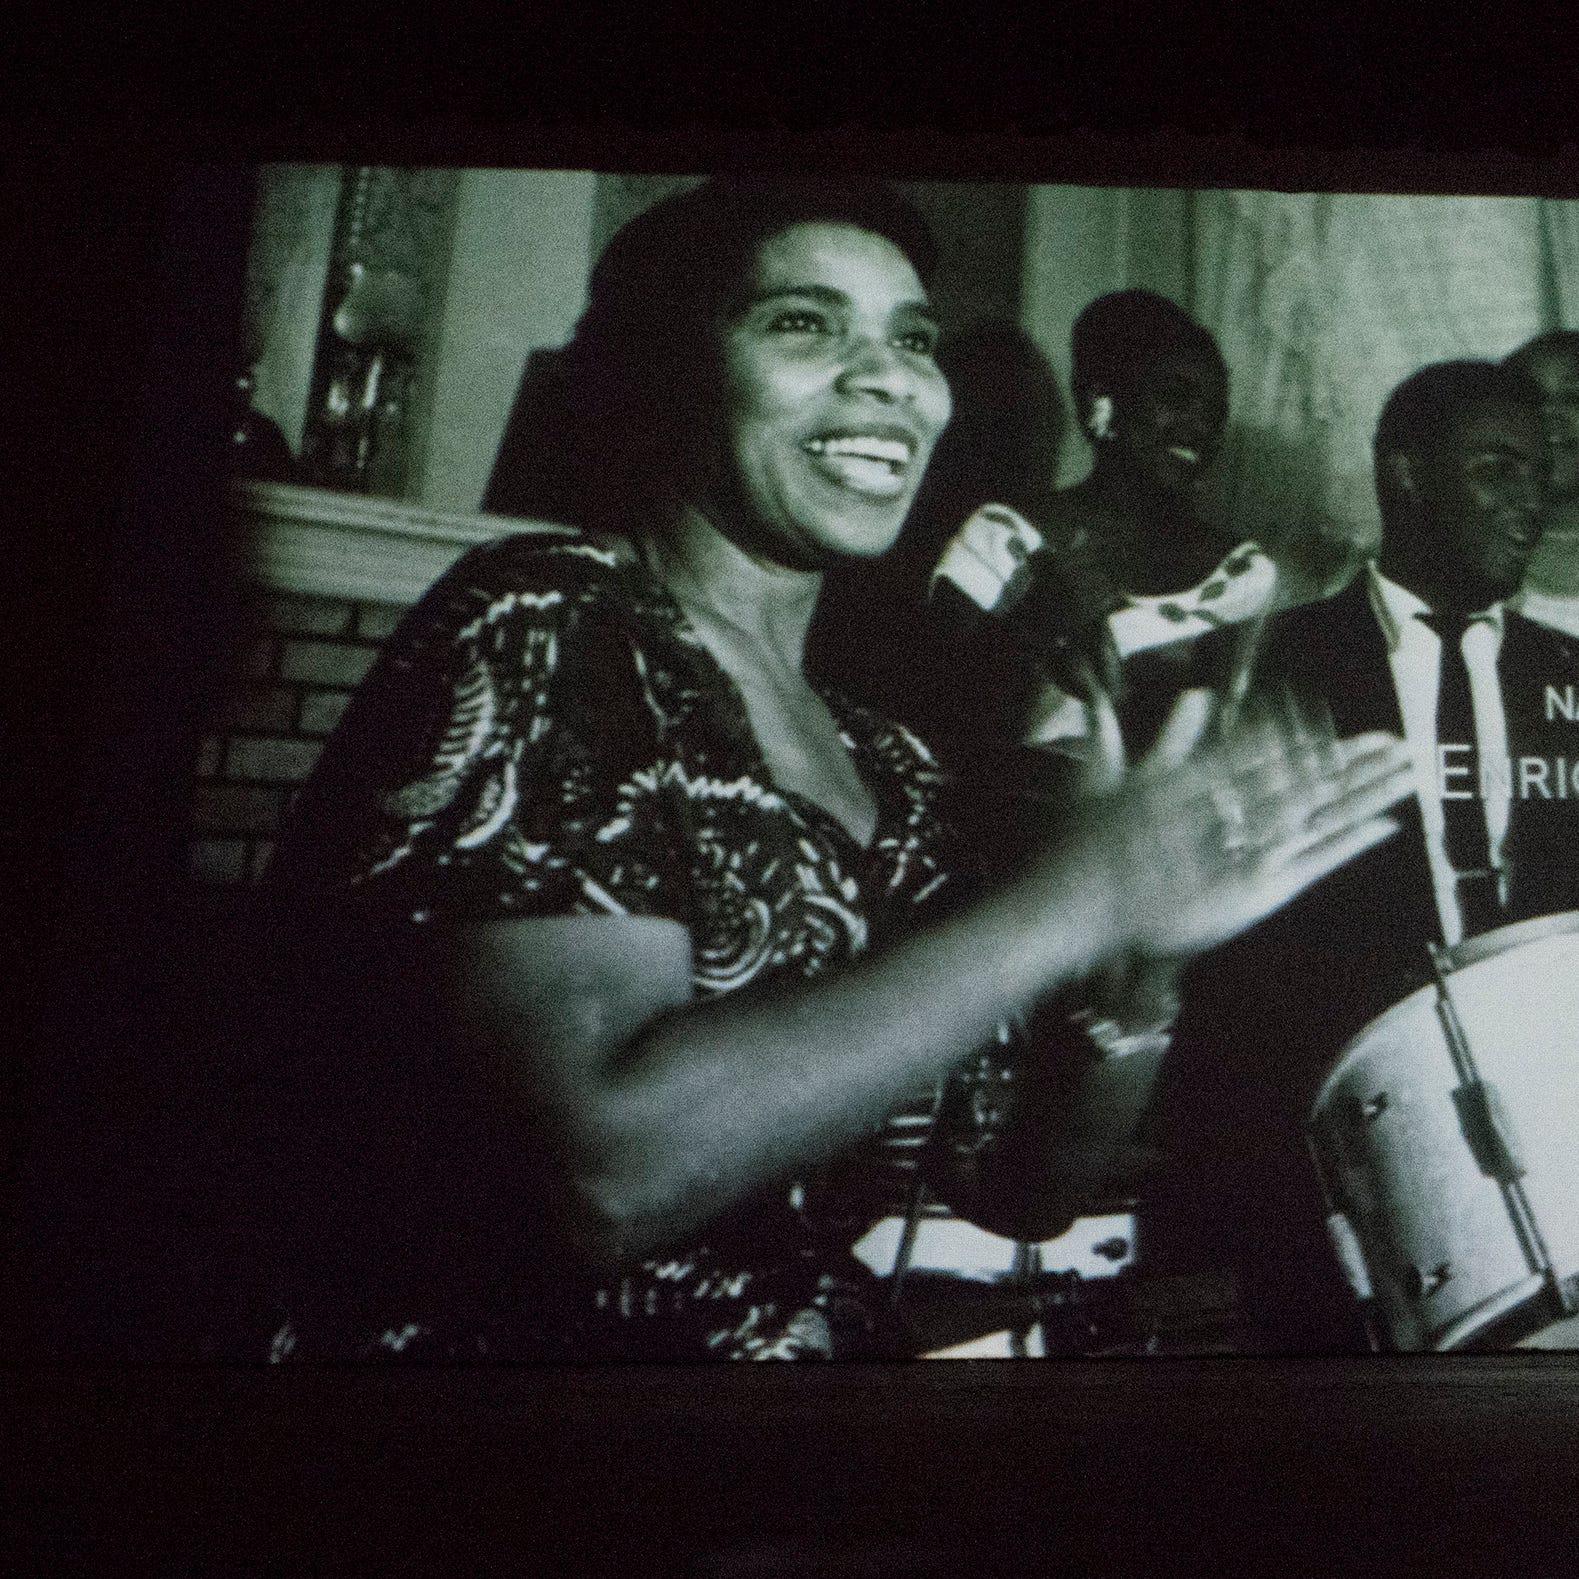 Bravo for bravery: Filmmaker tells Marian Anderson's story